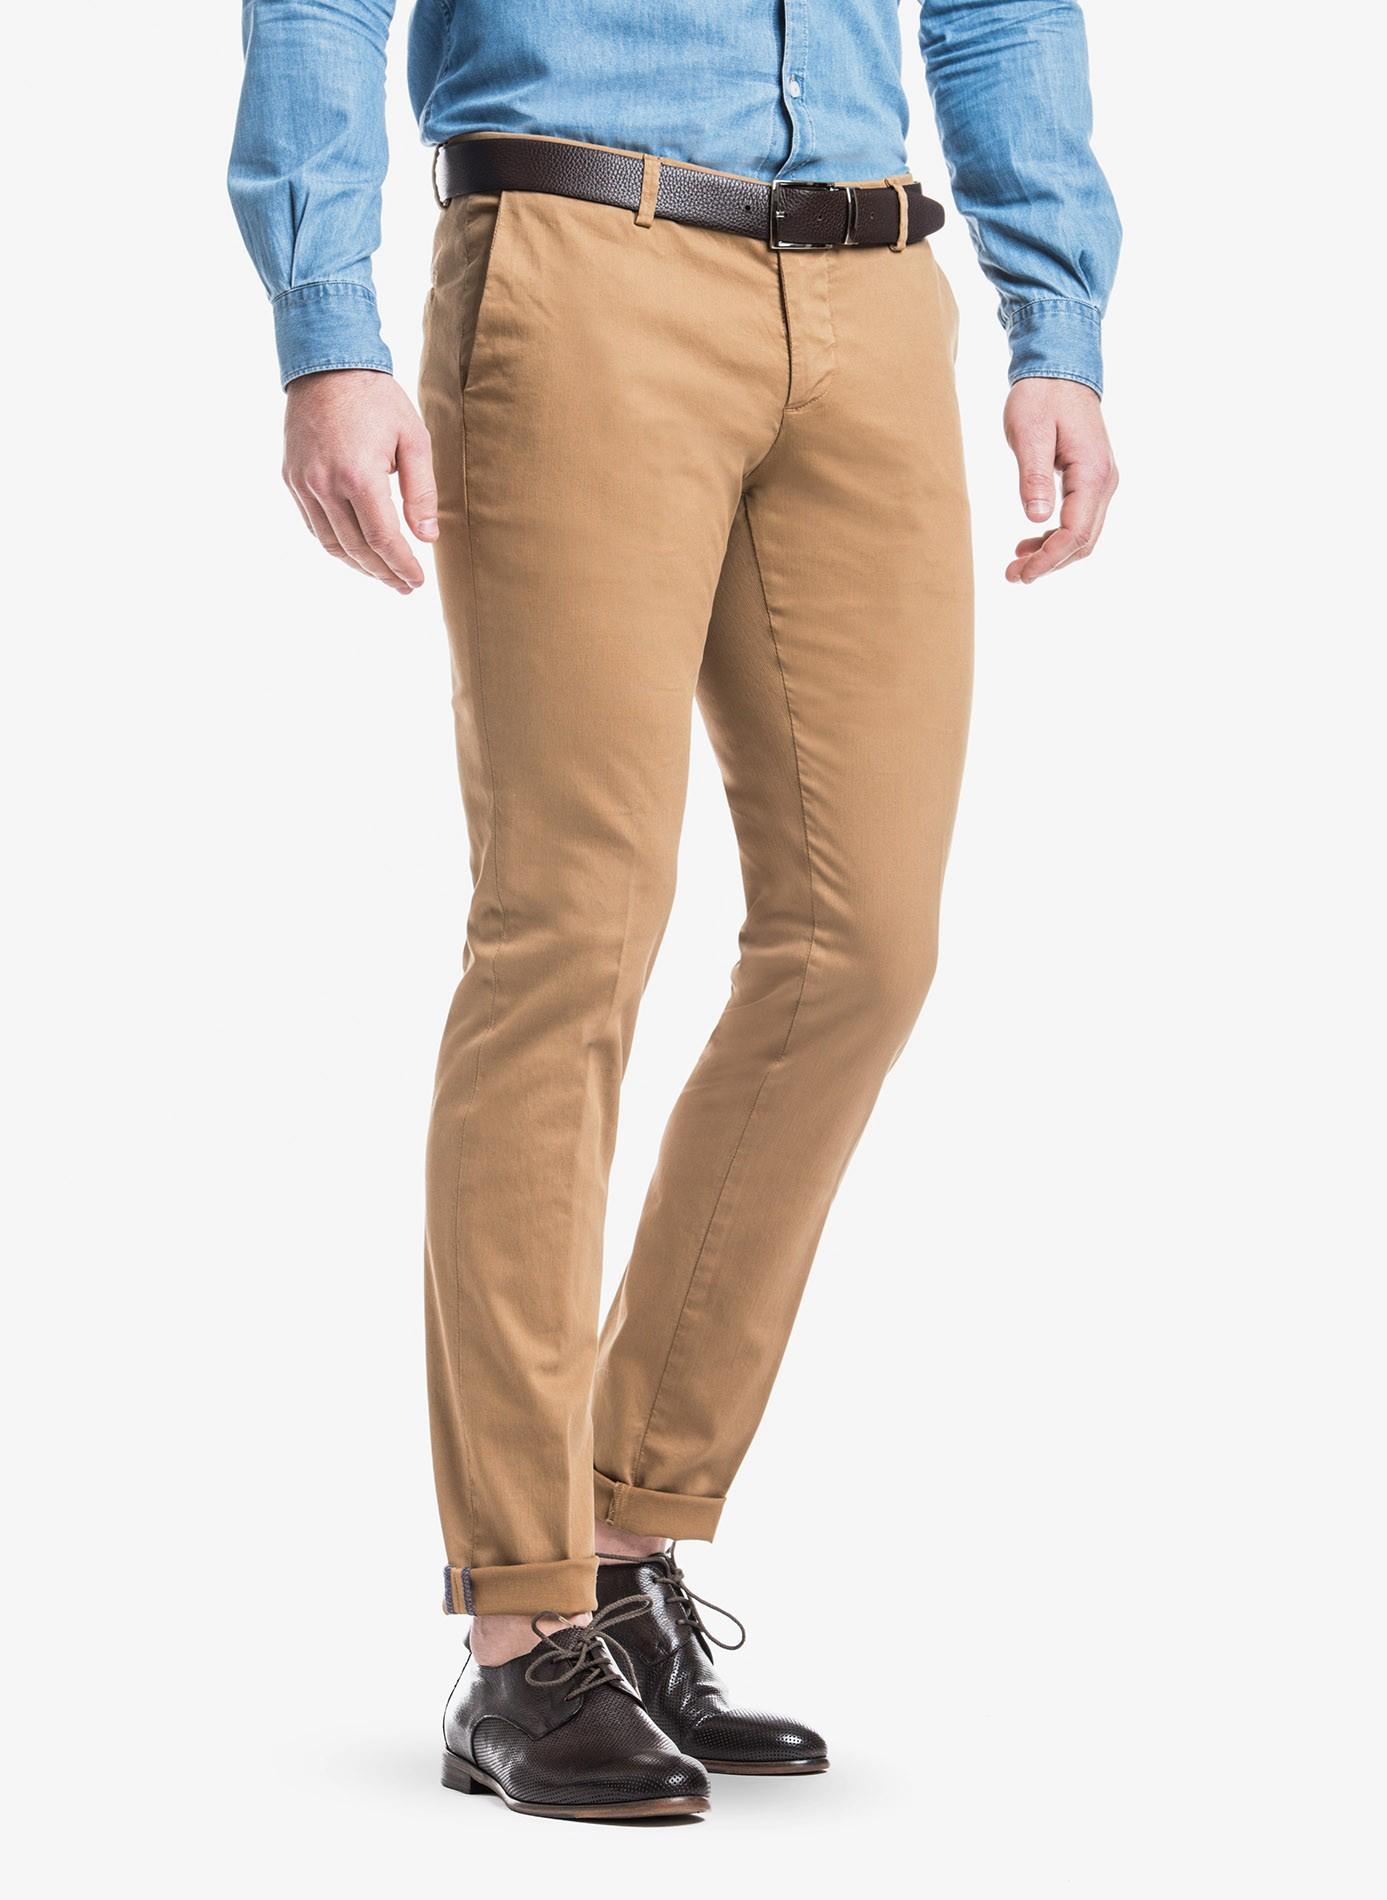 f3cd4fb5888fc0 John Barritt man chinos, slim fit, in stretch cotton fabric with micro  design, garment-dye. Composition 97% cotton 3% elastane. Burned Brown